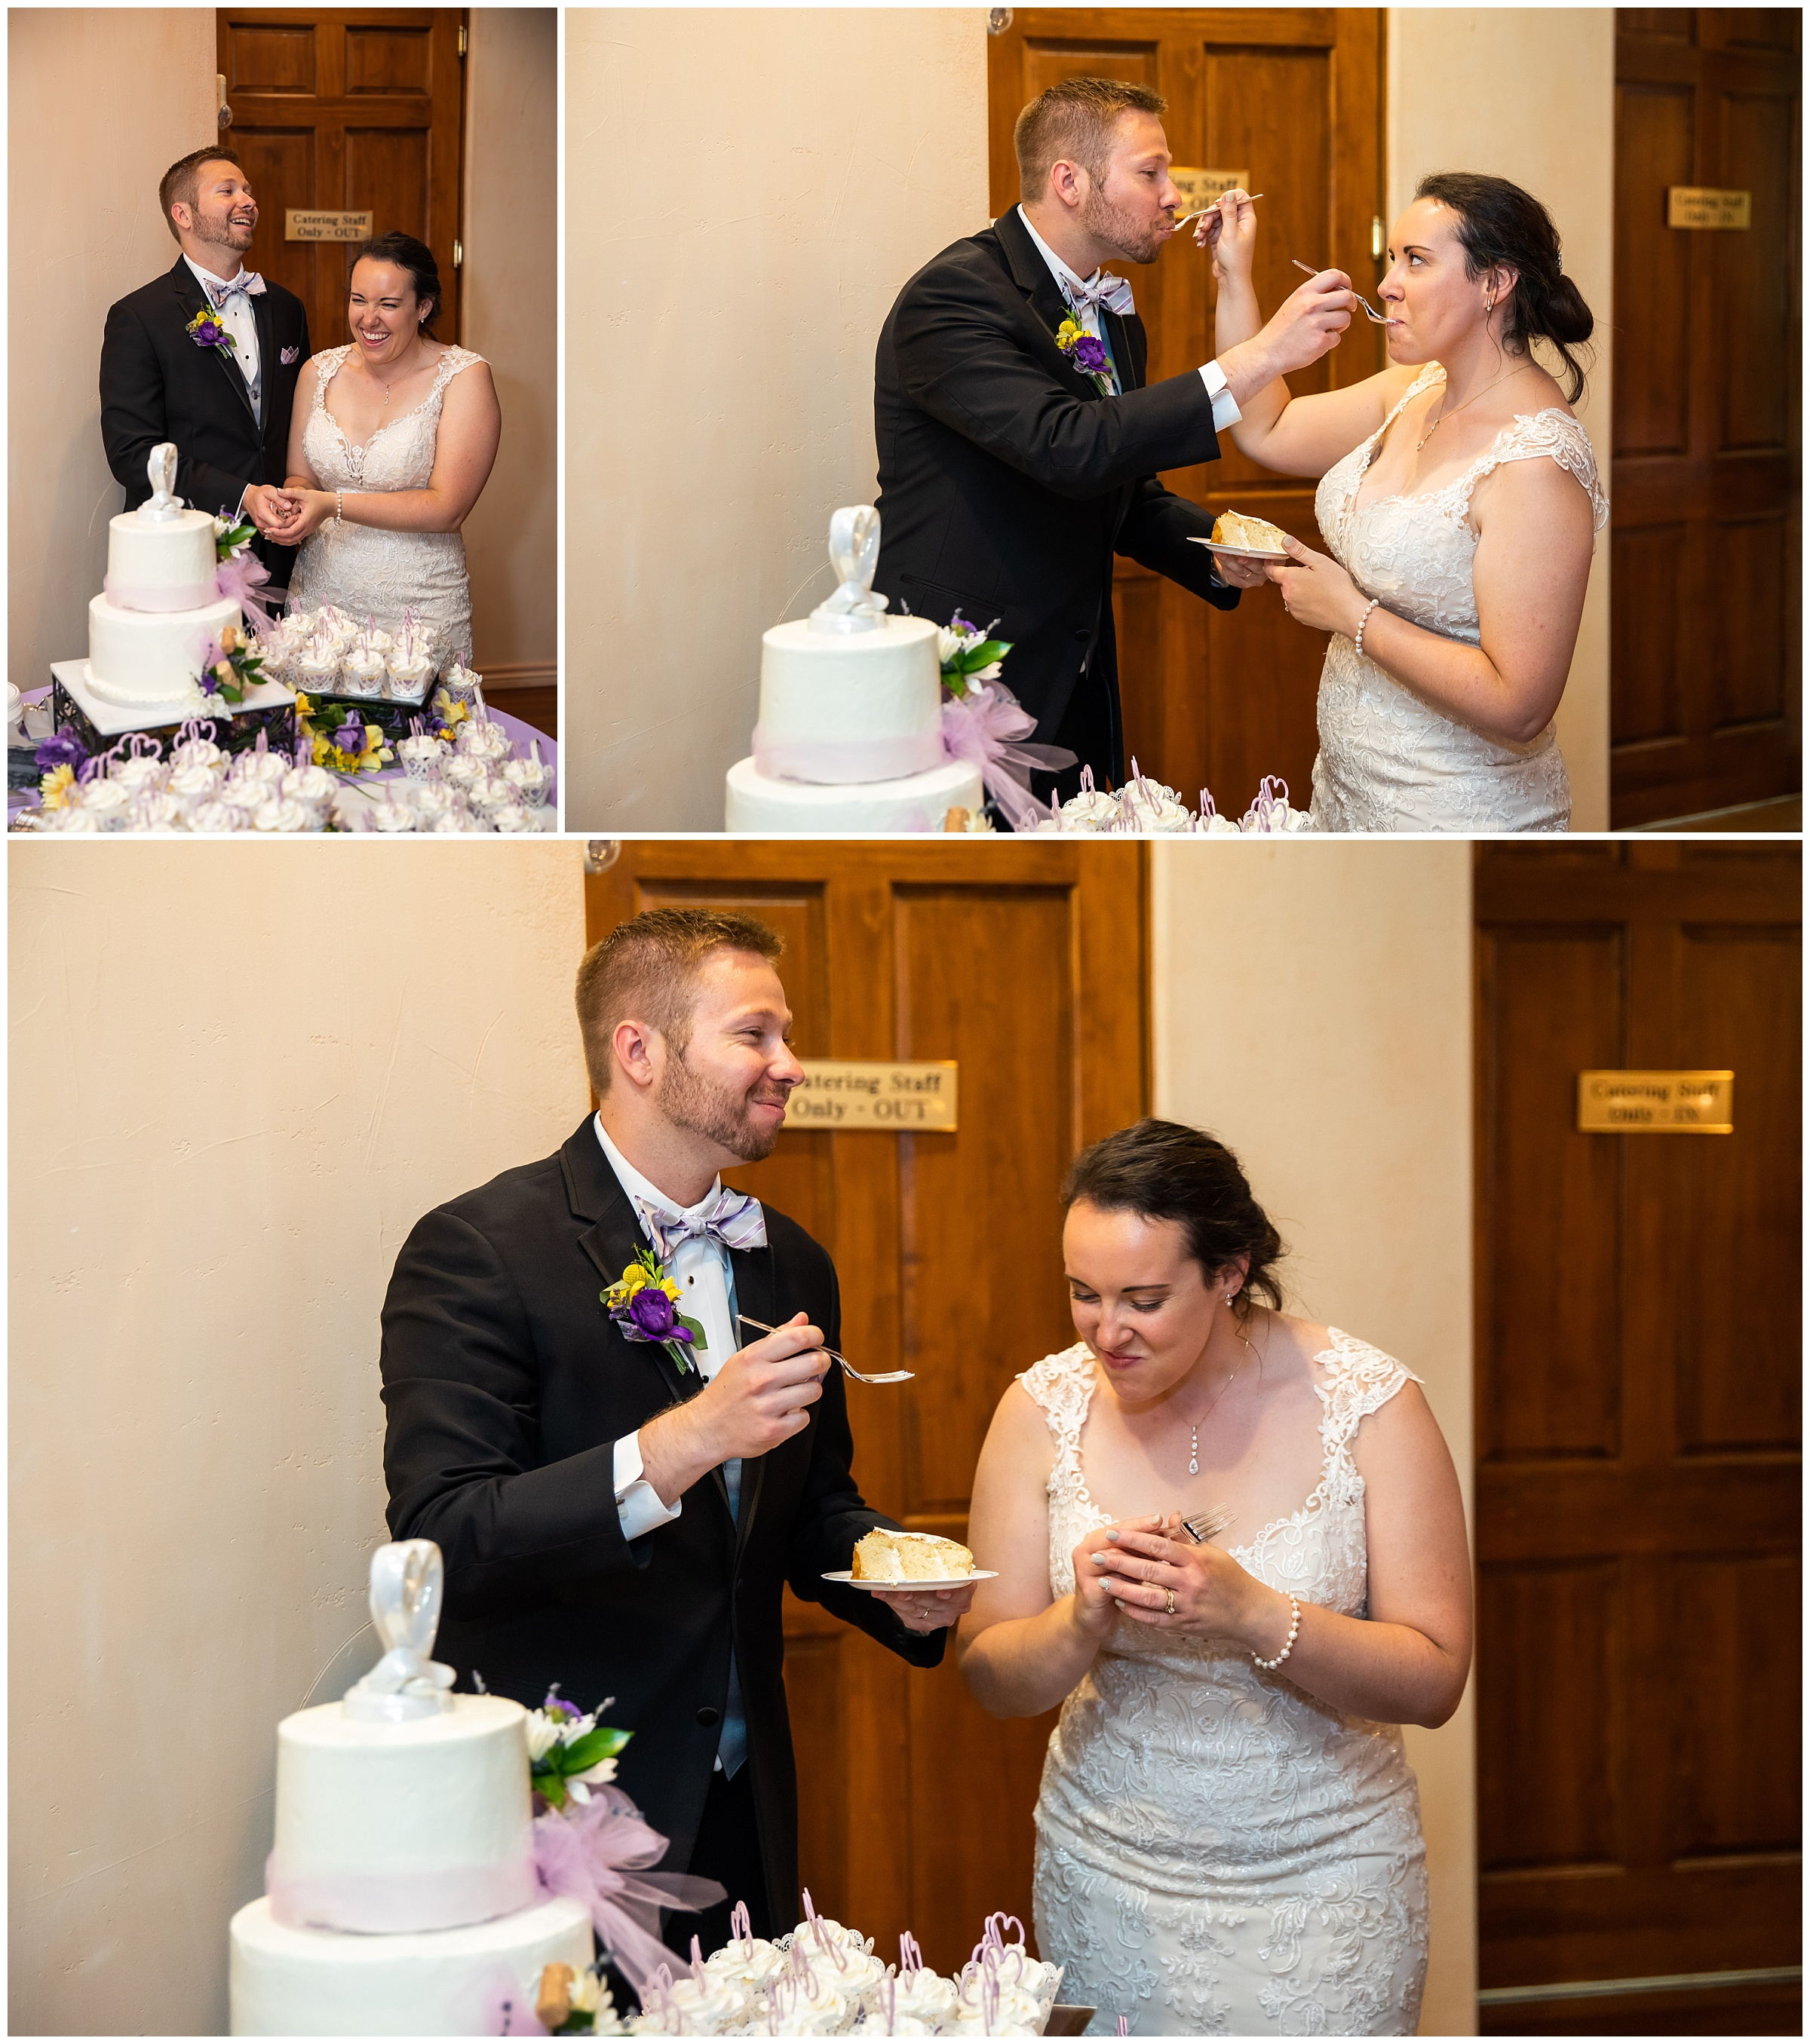 Grand Junction Wedding Photographer 0063.jpg